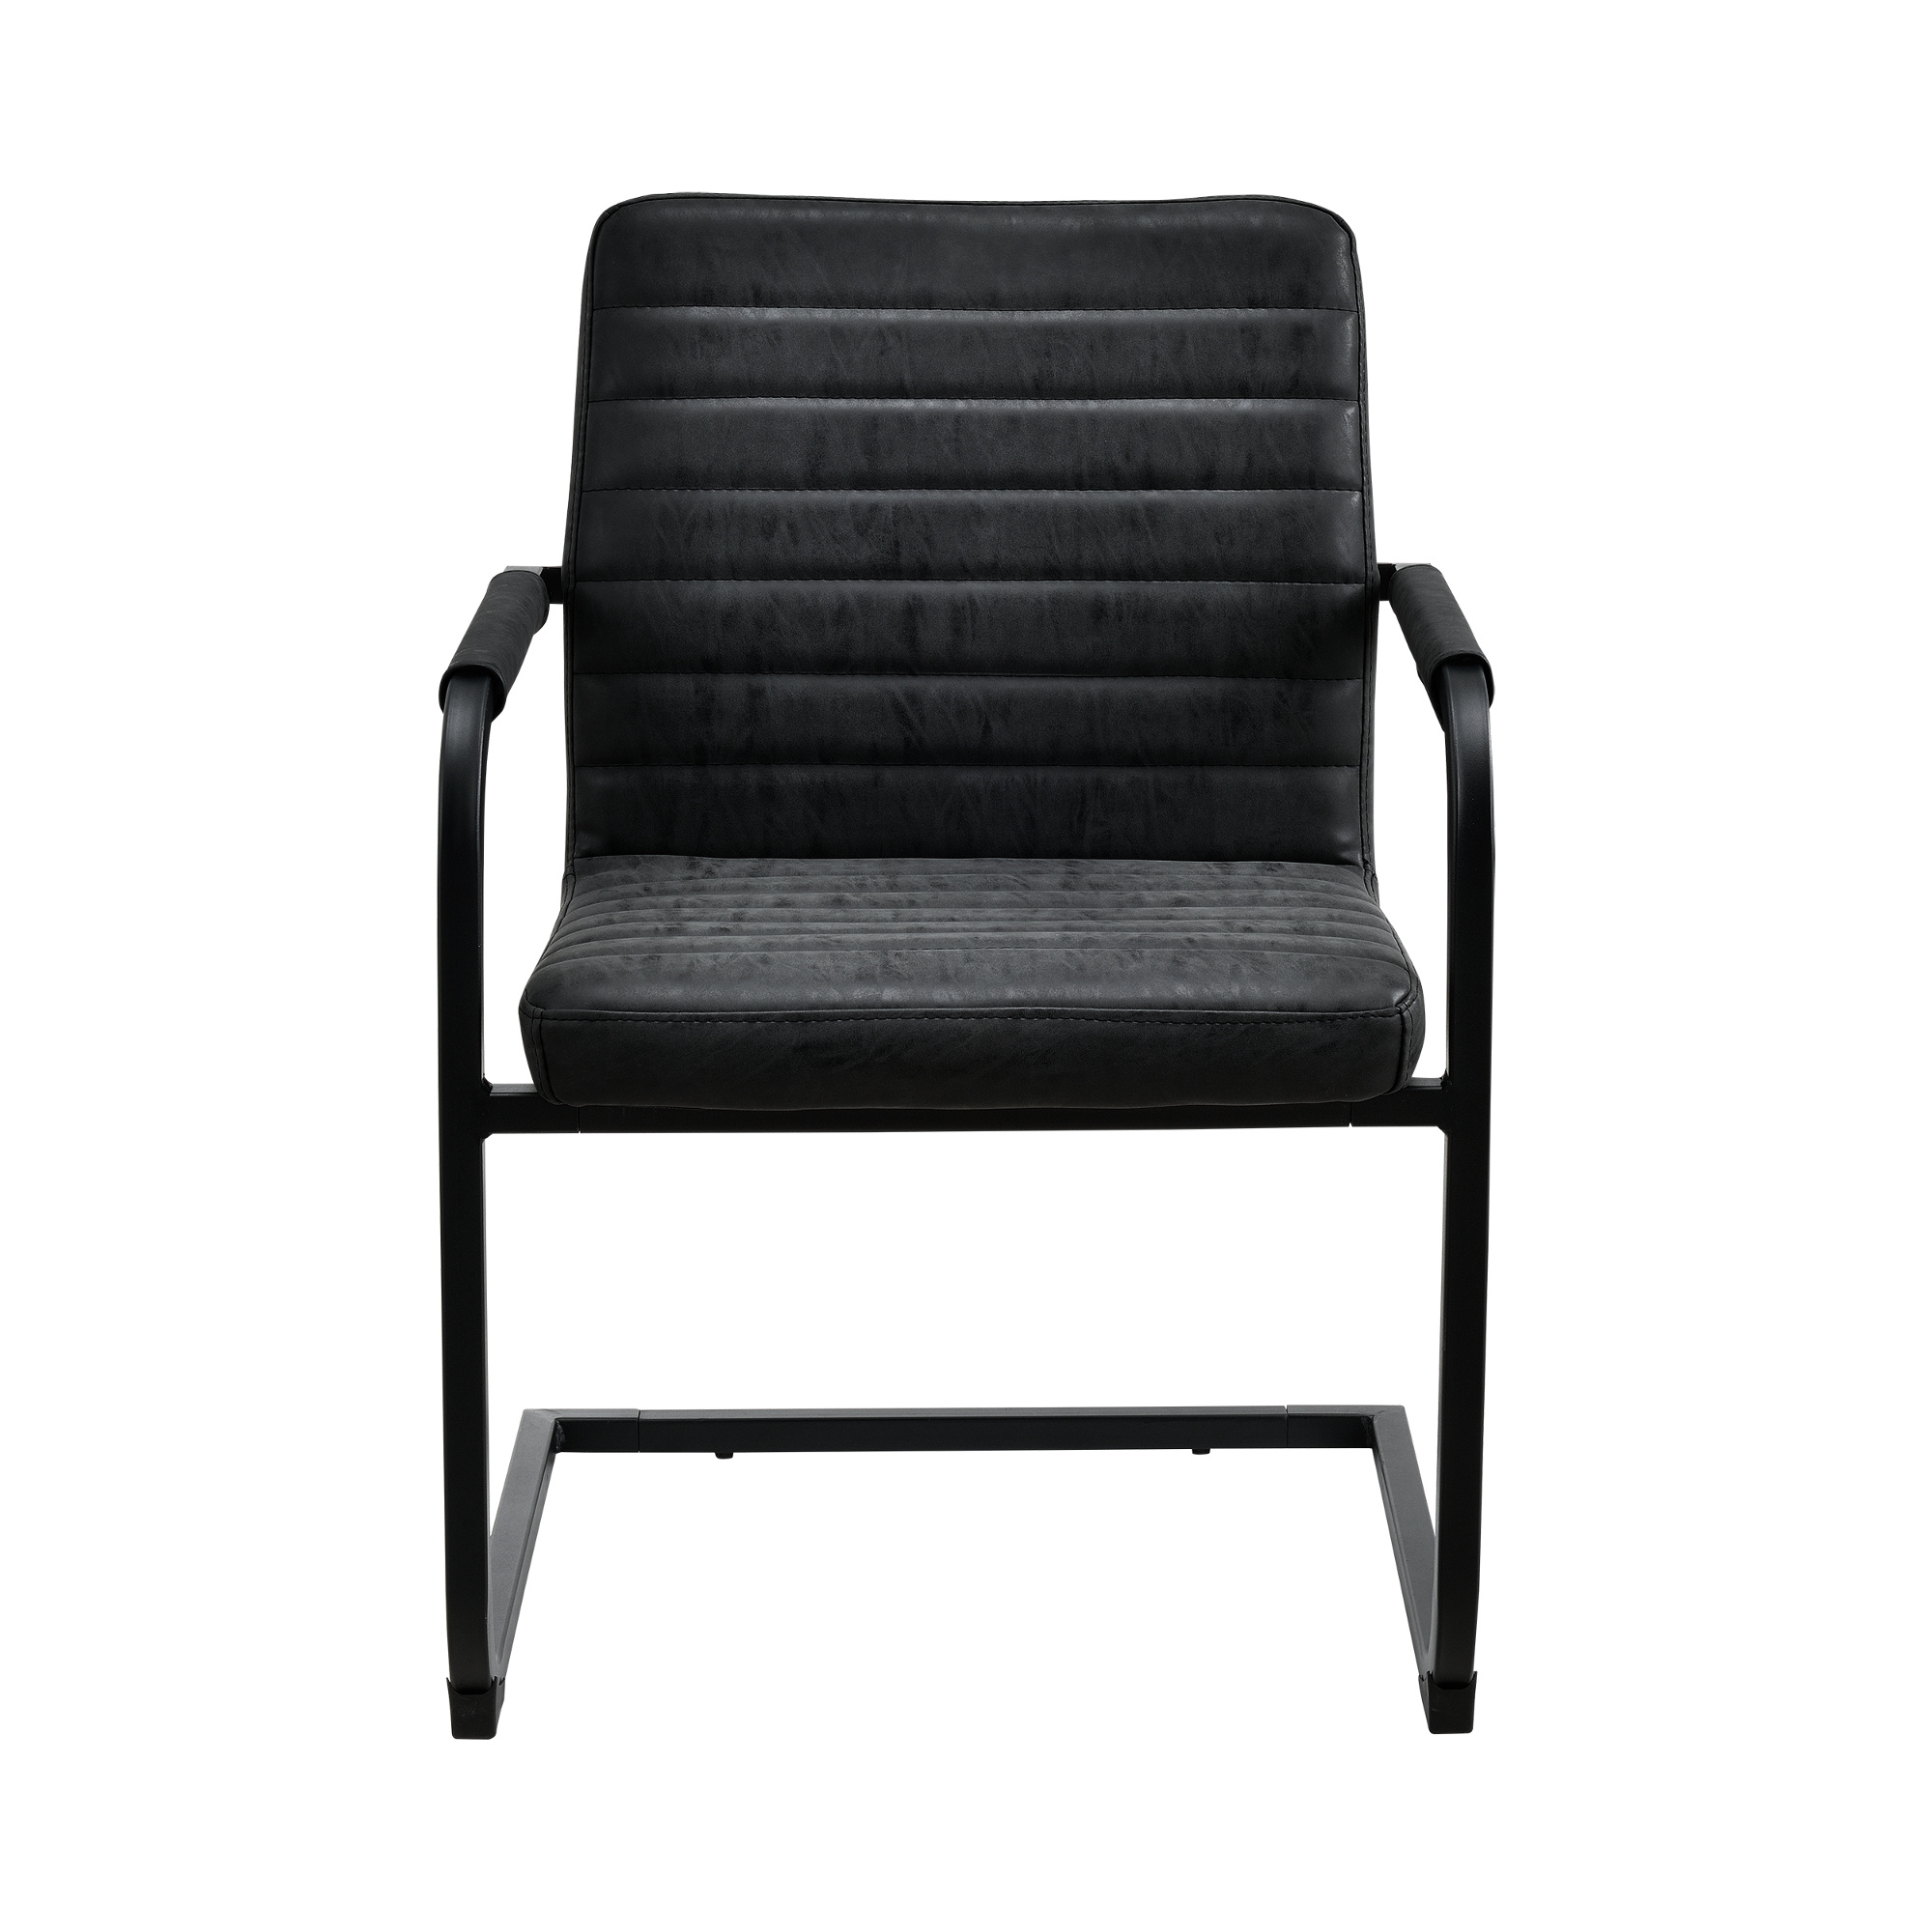 6x chaises cantilever noir 86x60cm salle manger balan ant chaise ebay. Black Bedroom Furniture Sets. Home Design Ideas